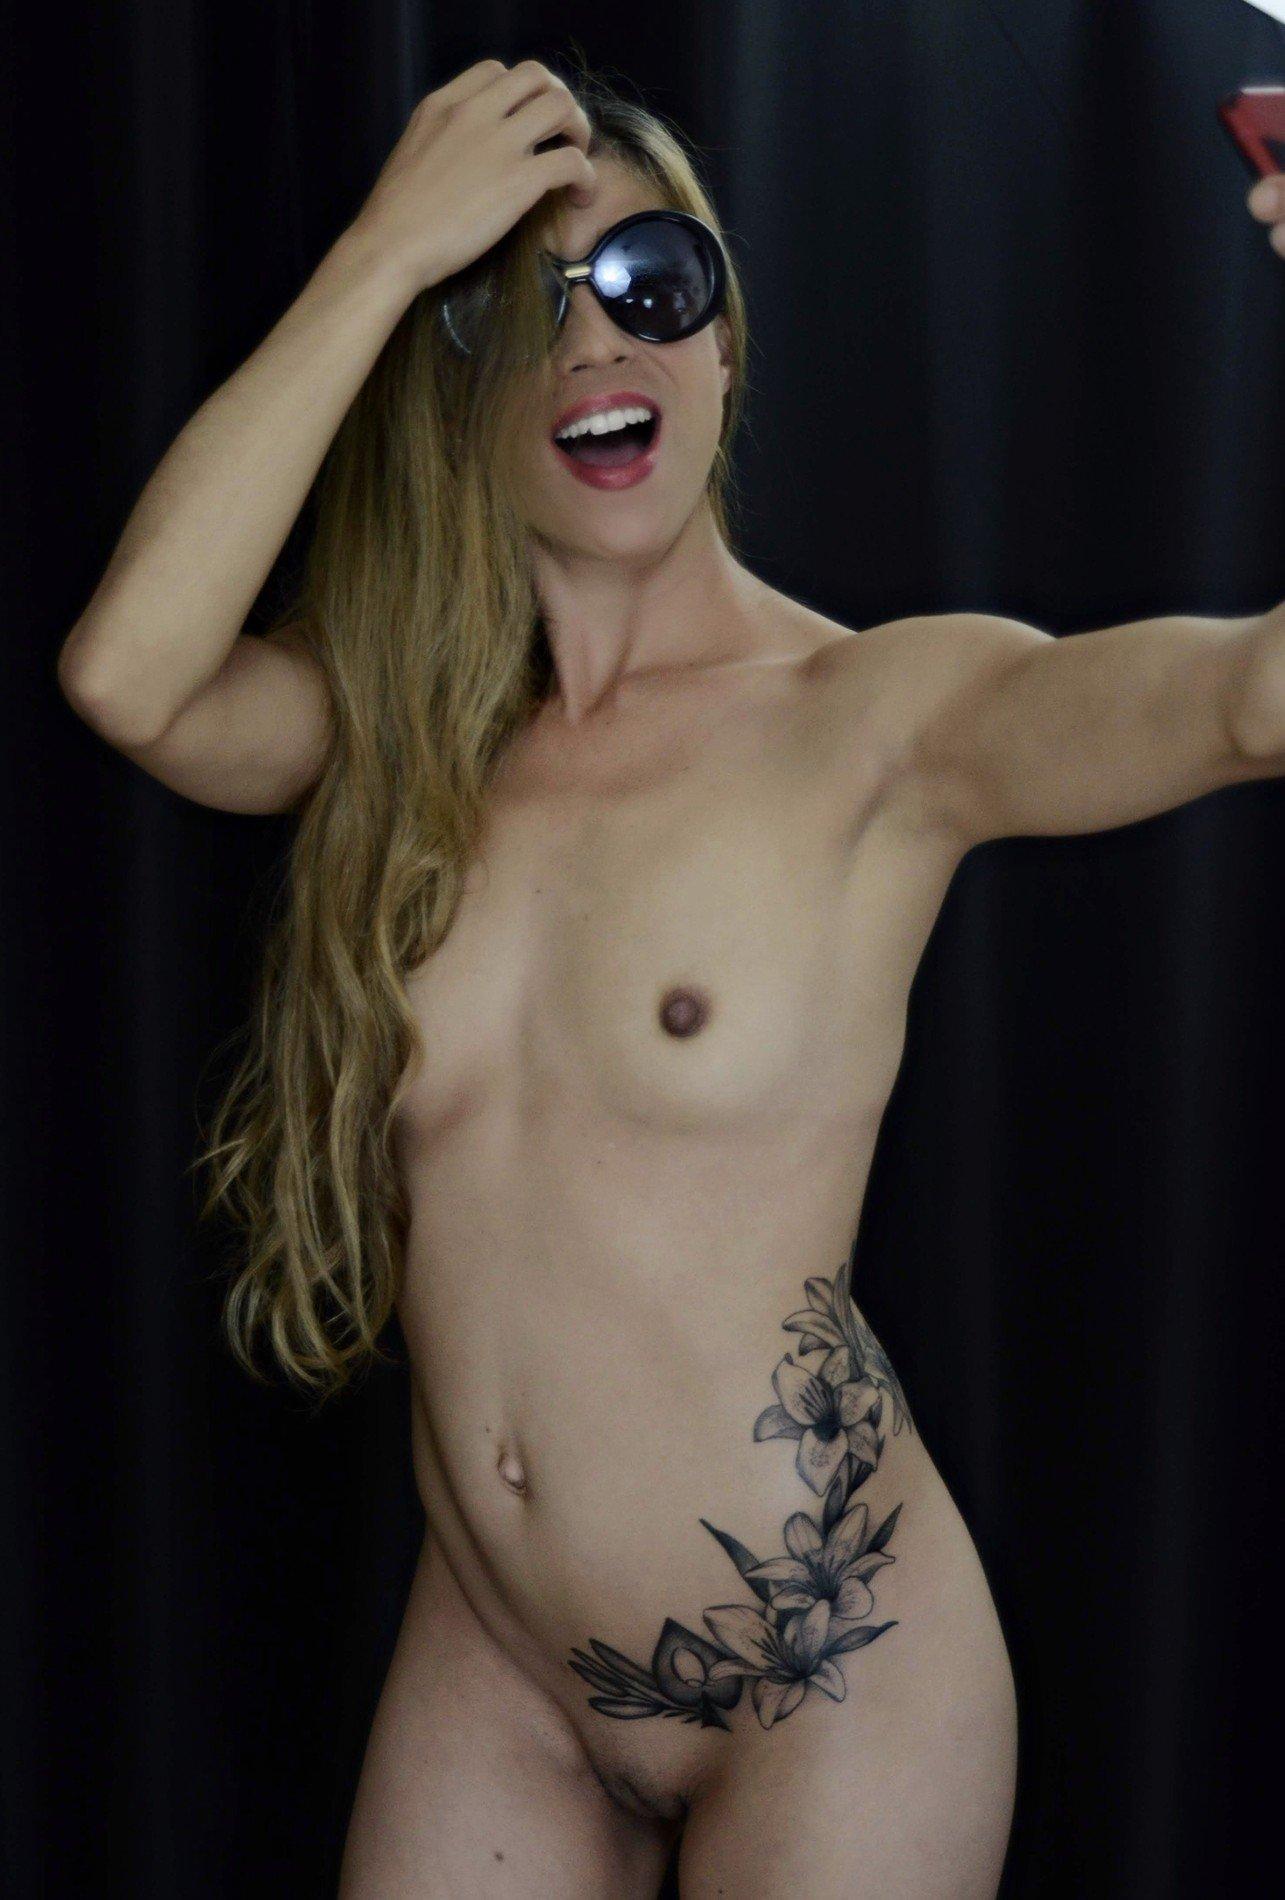 #hotwife #queenofspades #lettywild #ksalsafadomg #inked Photo in topic Tattoo by Letty - ksalsafadomg